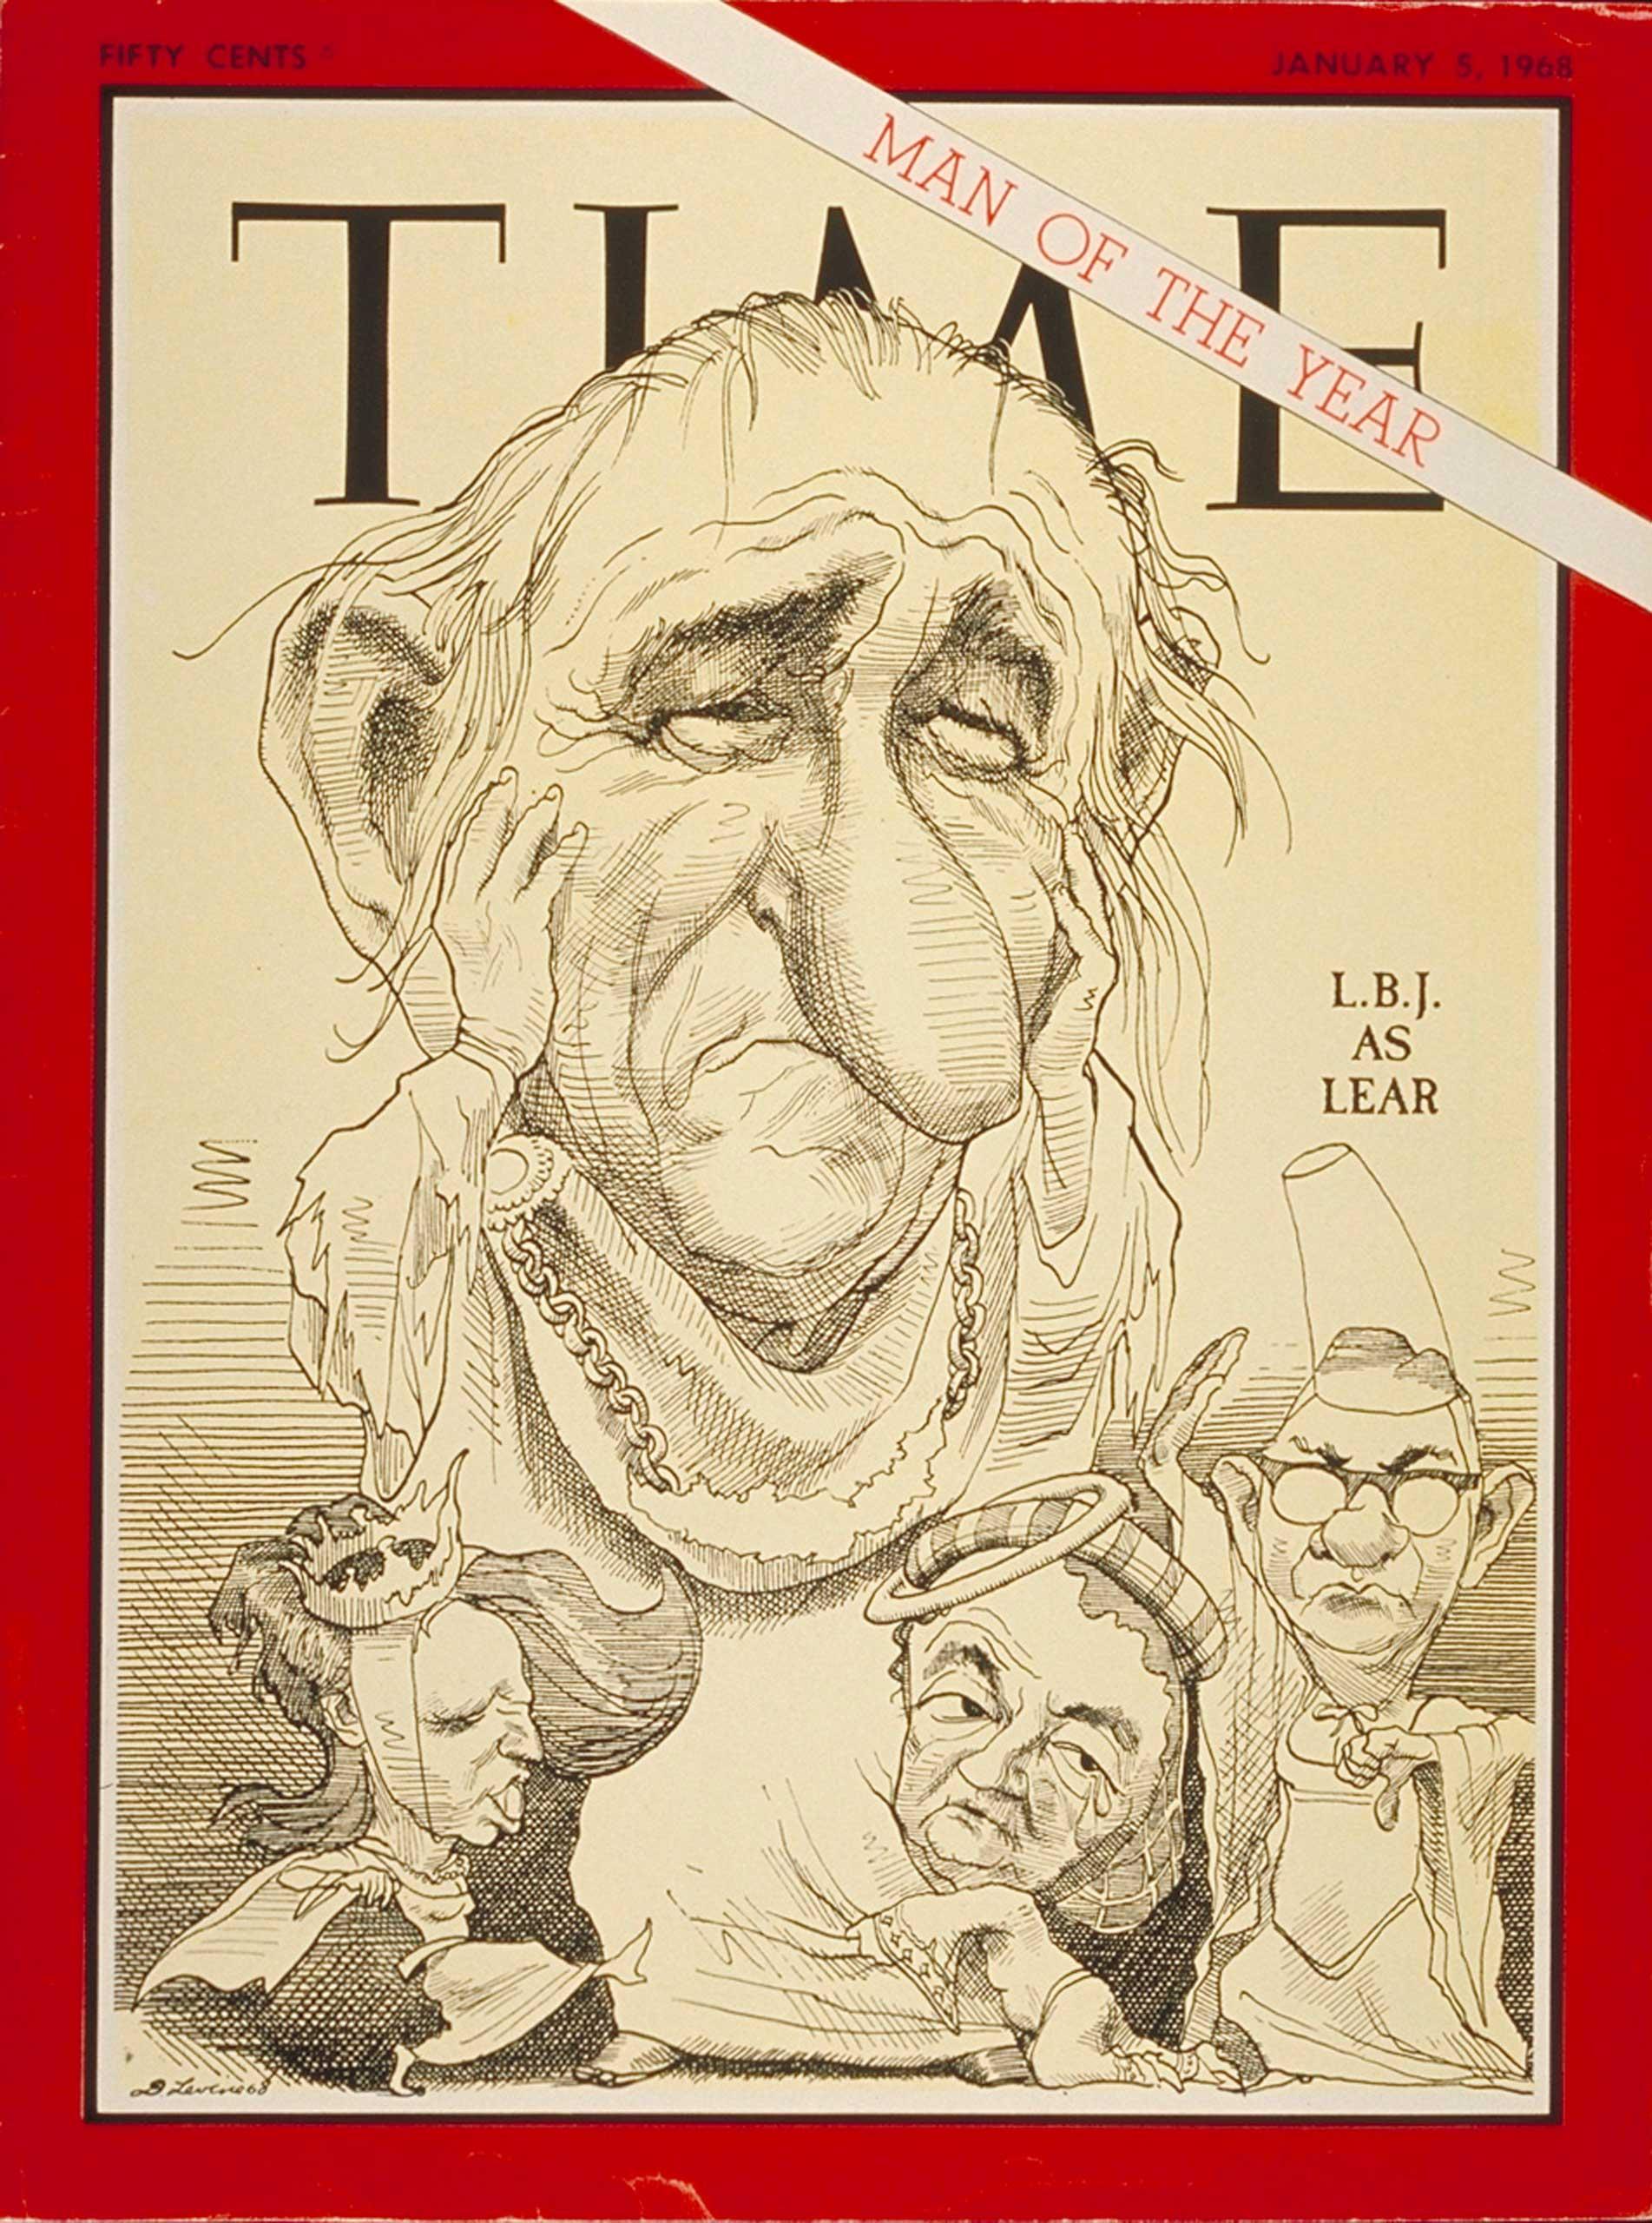 1967: President Lyndon B. Johnson